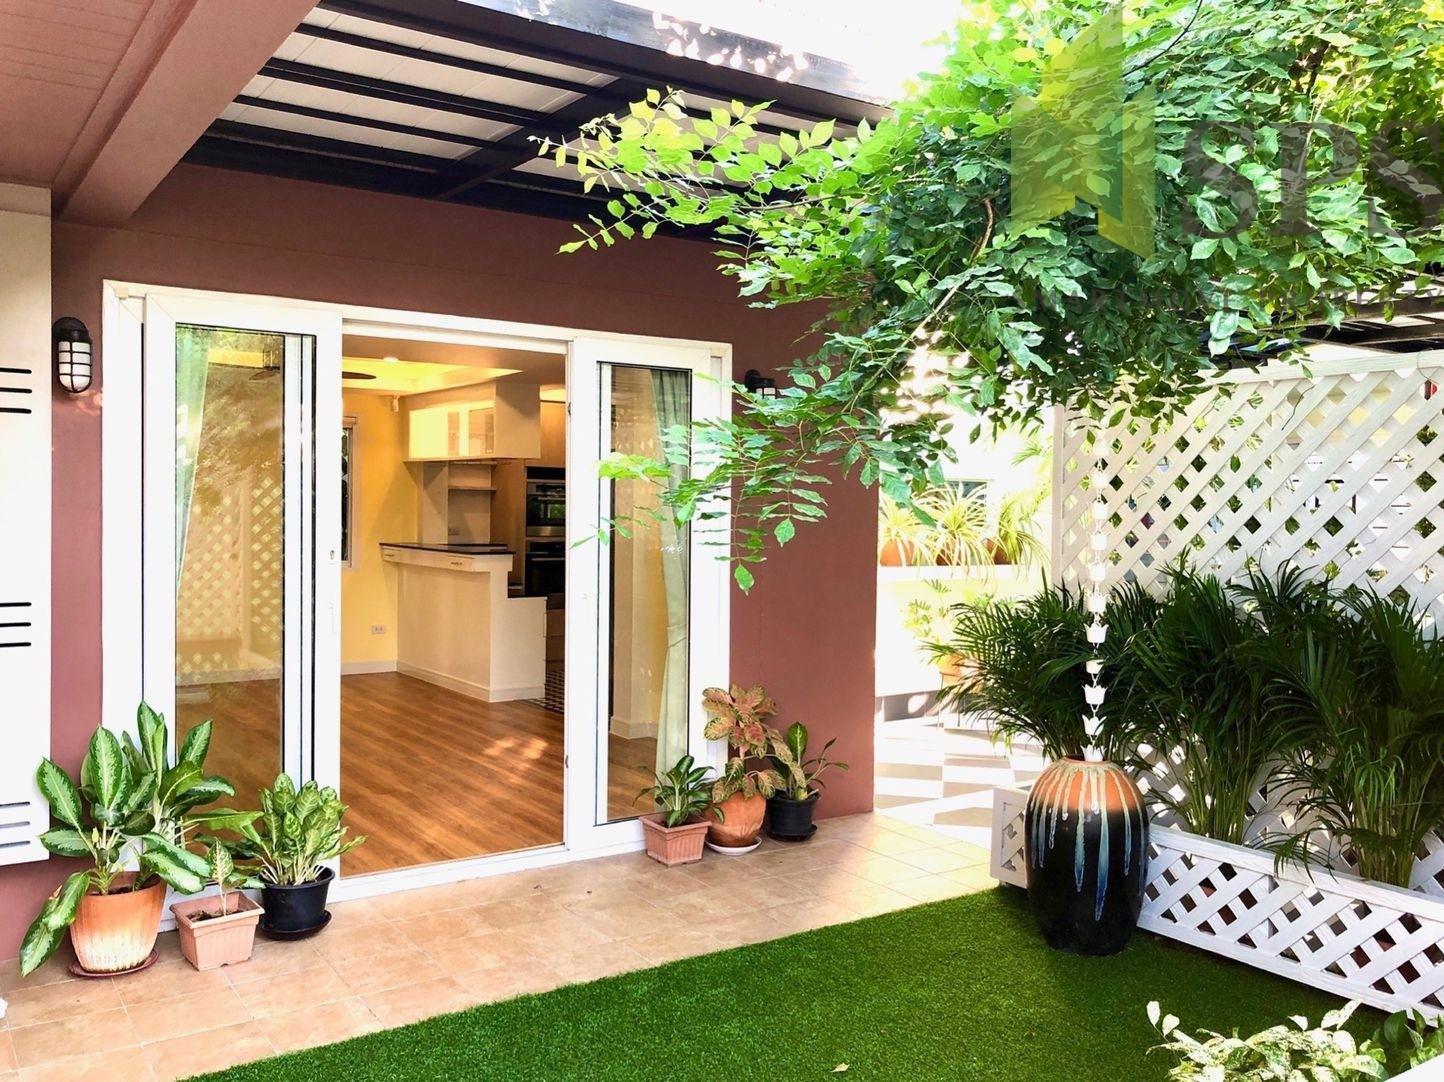 For Rent Single house near BTS Bangna บ้านเดี่ยวให้เช่าใกล้บีทีเอสบางนา ( SPSPE379)